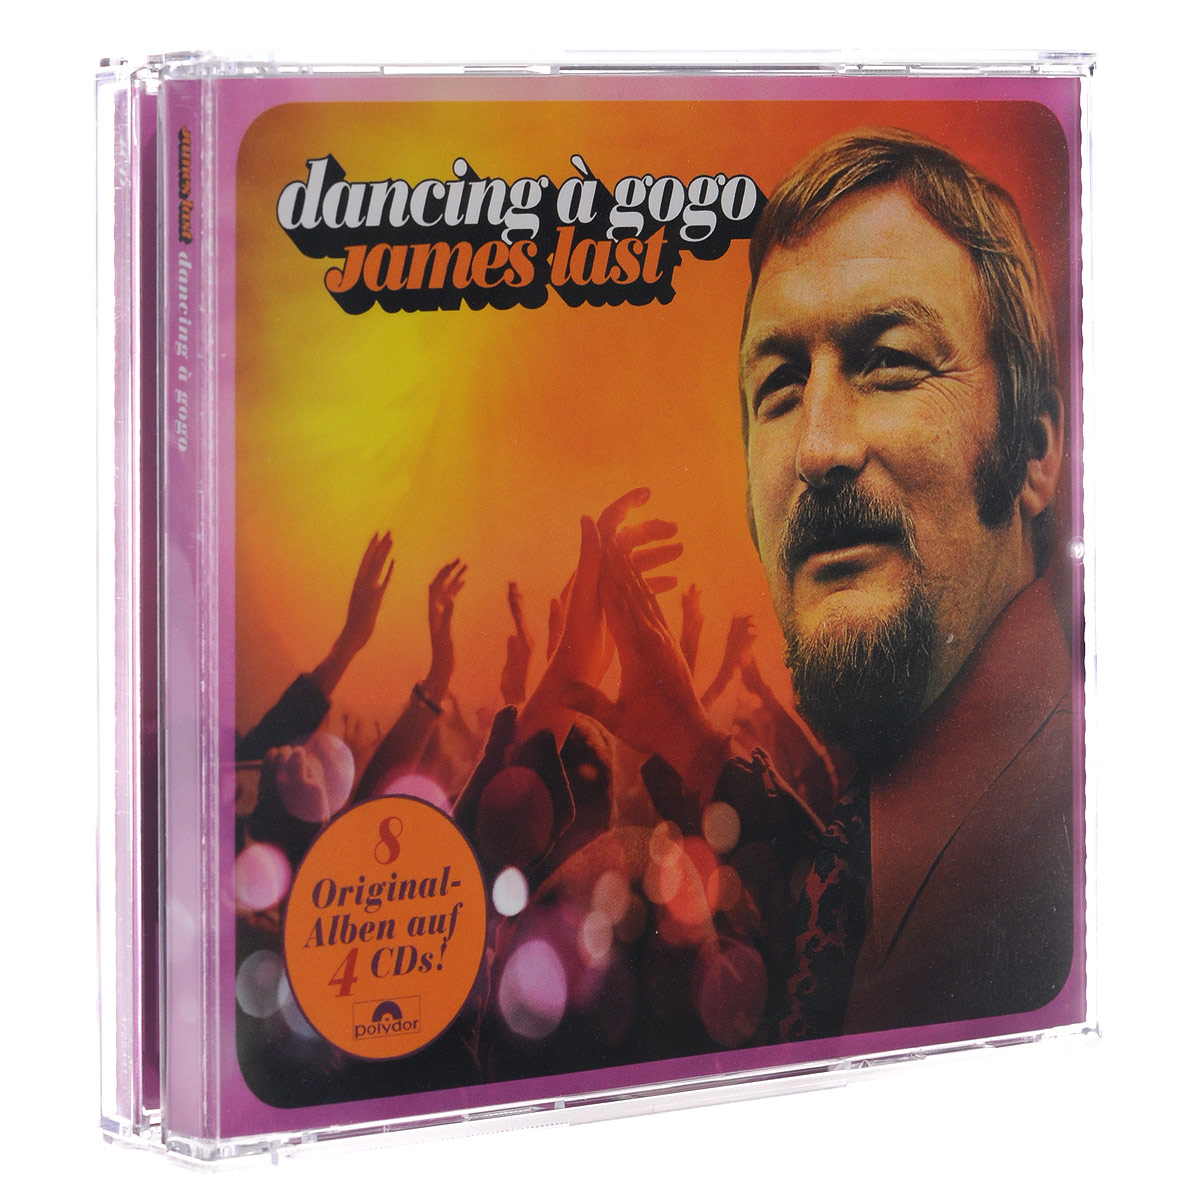 James Last. Dancing A Gogo (4 CD)